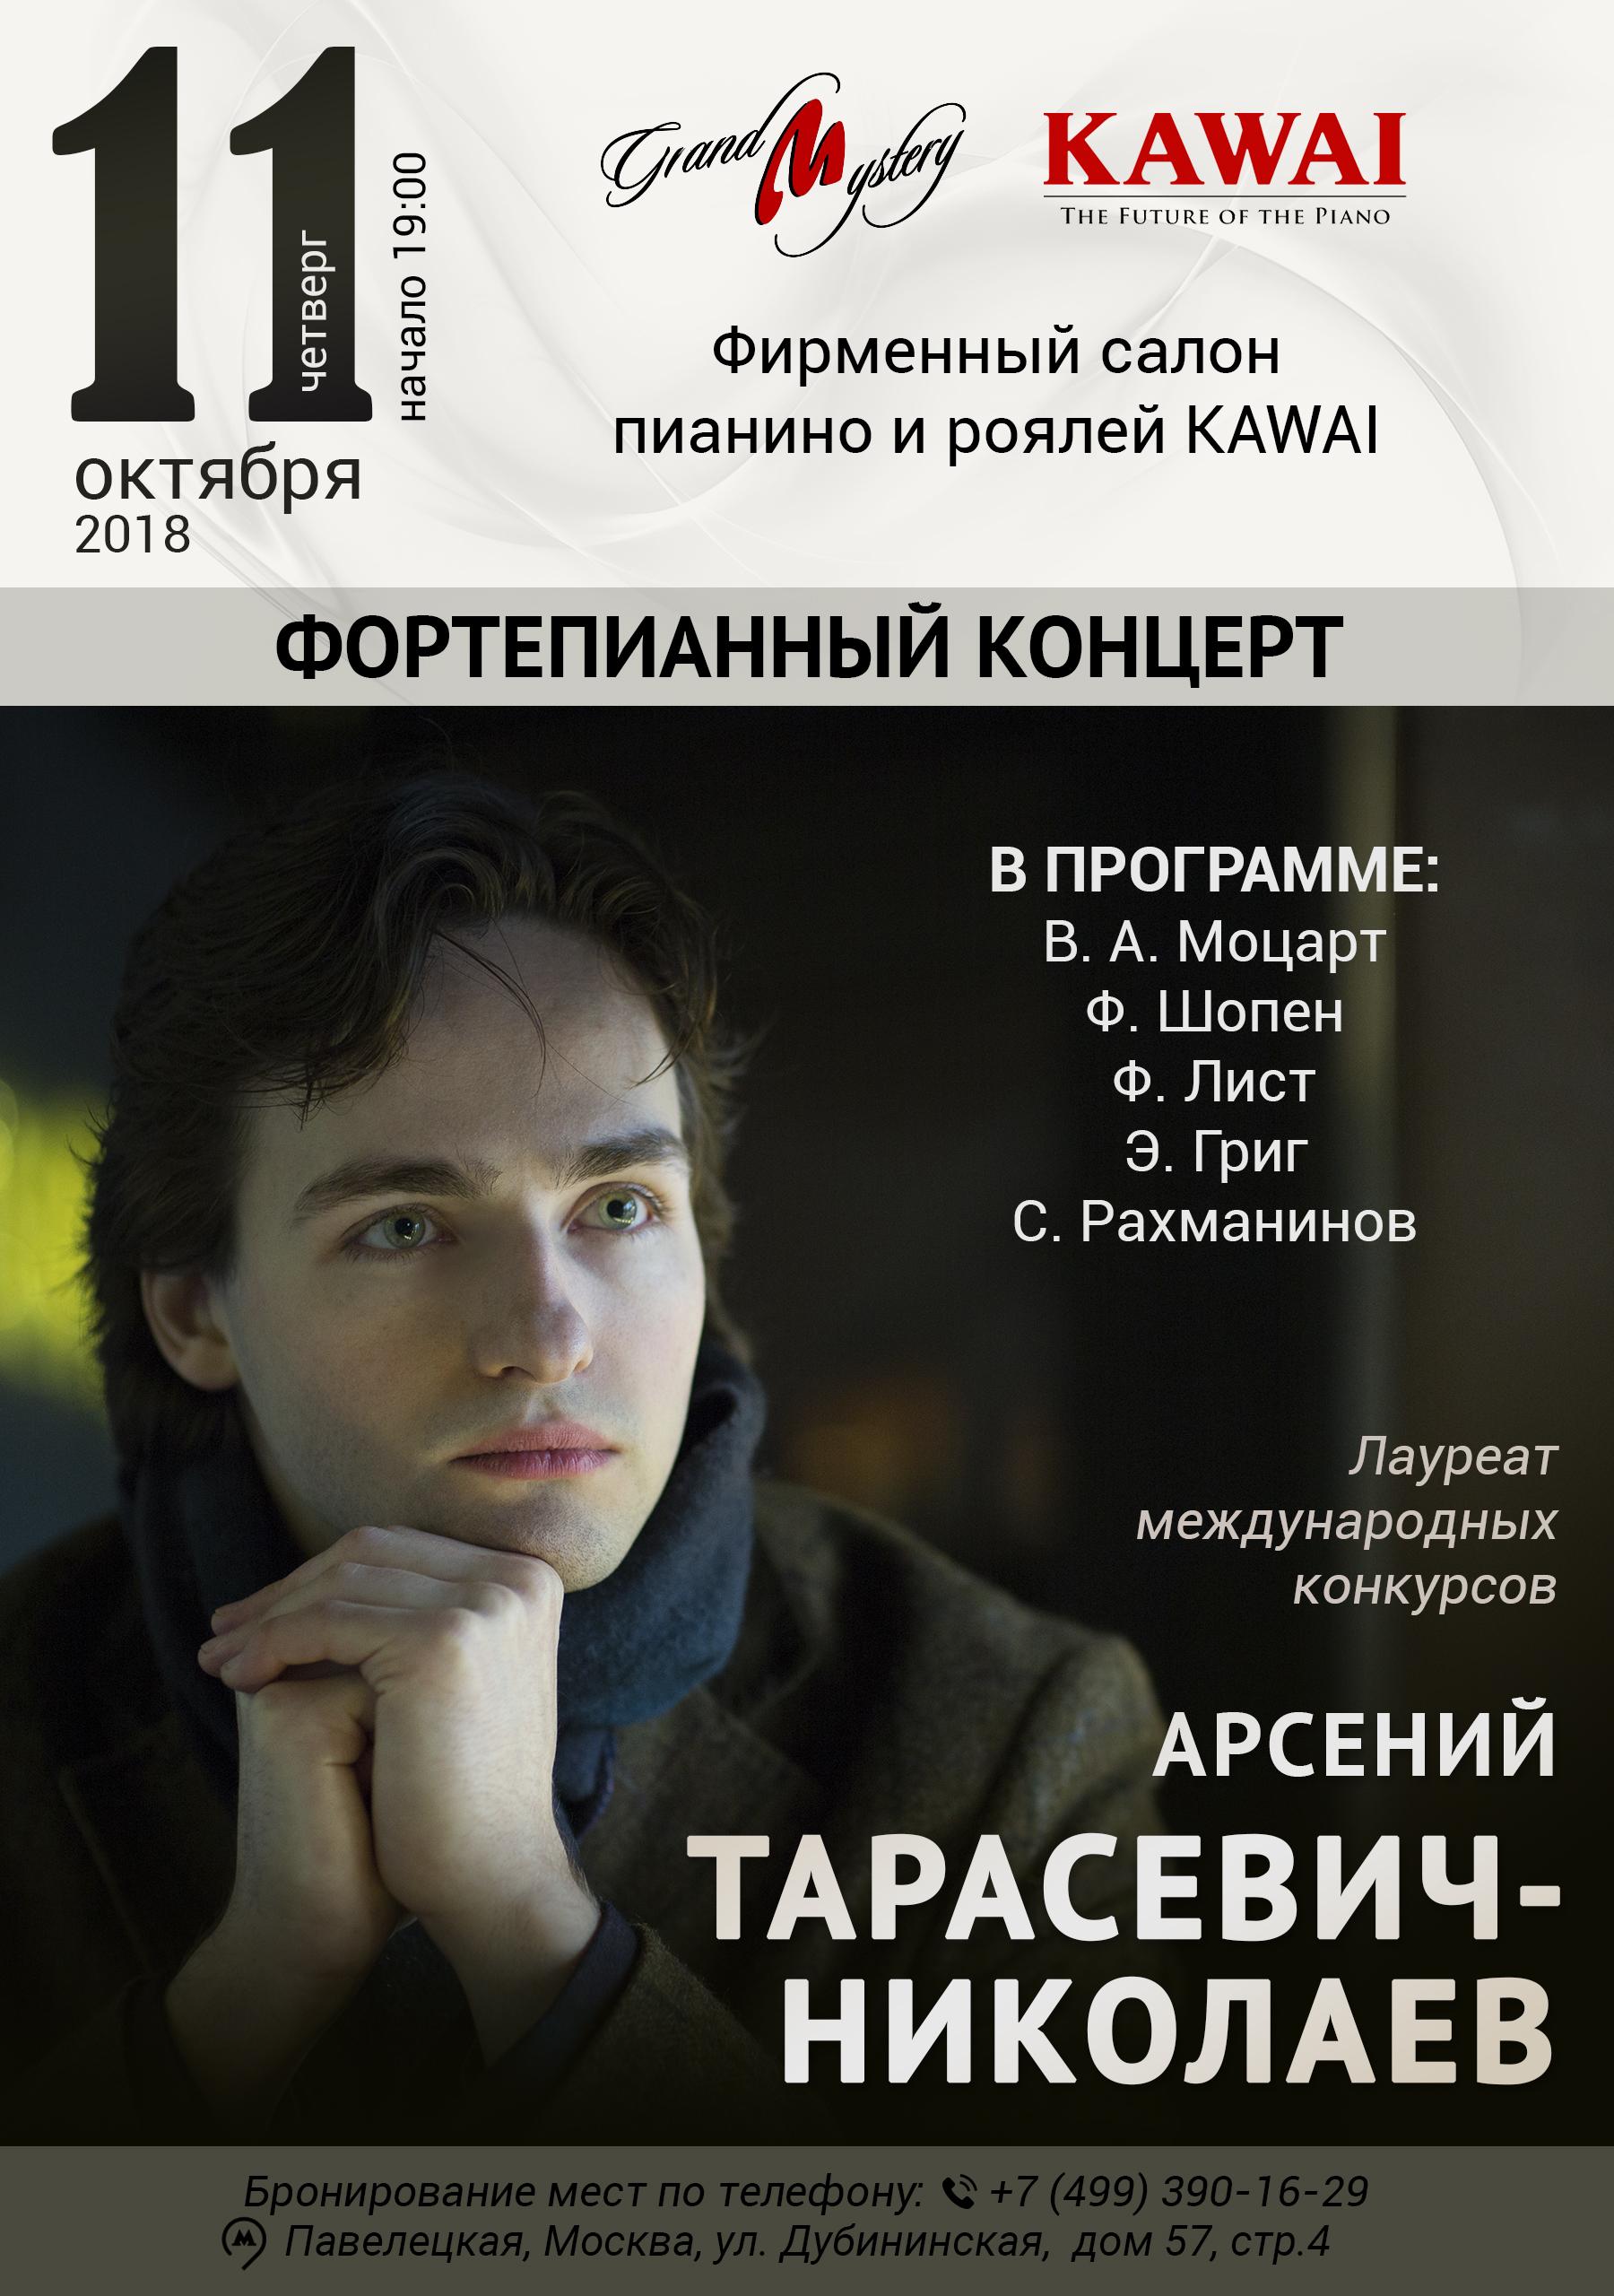 Фортепианный вечер Арсения Тарасевича-Николаева